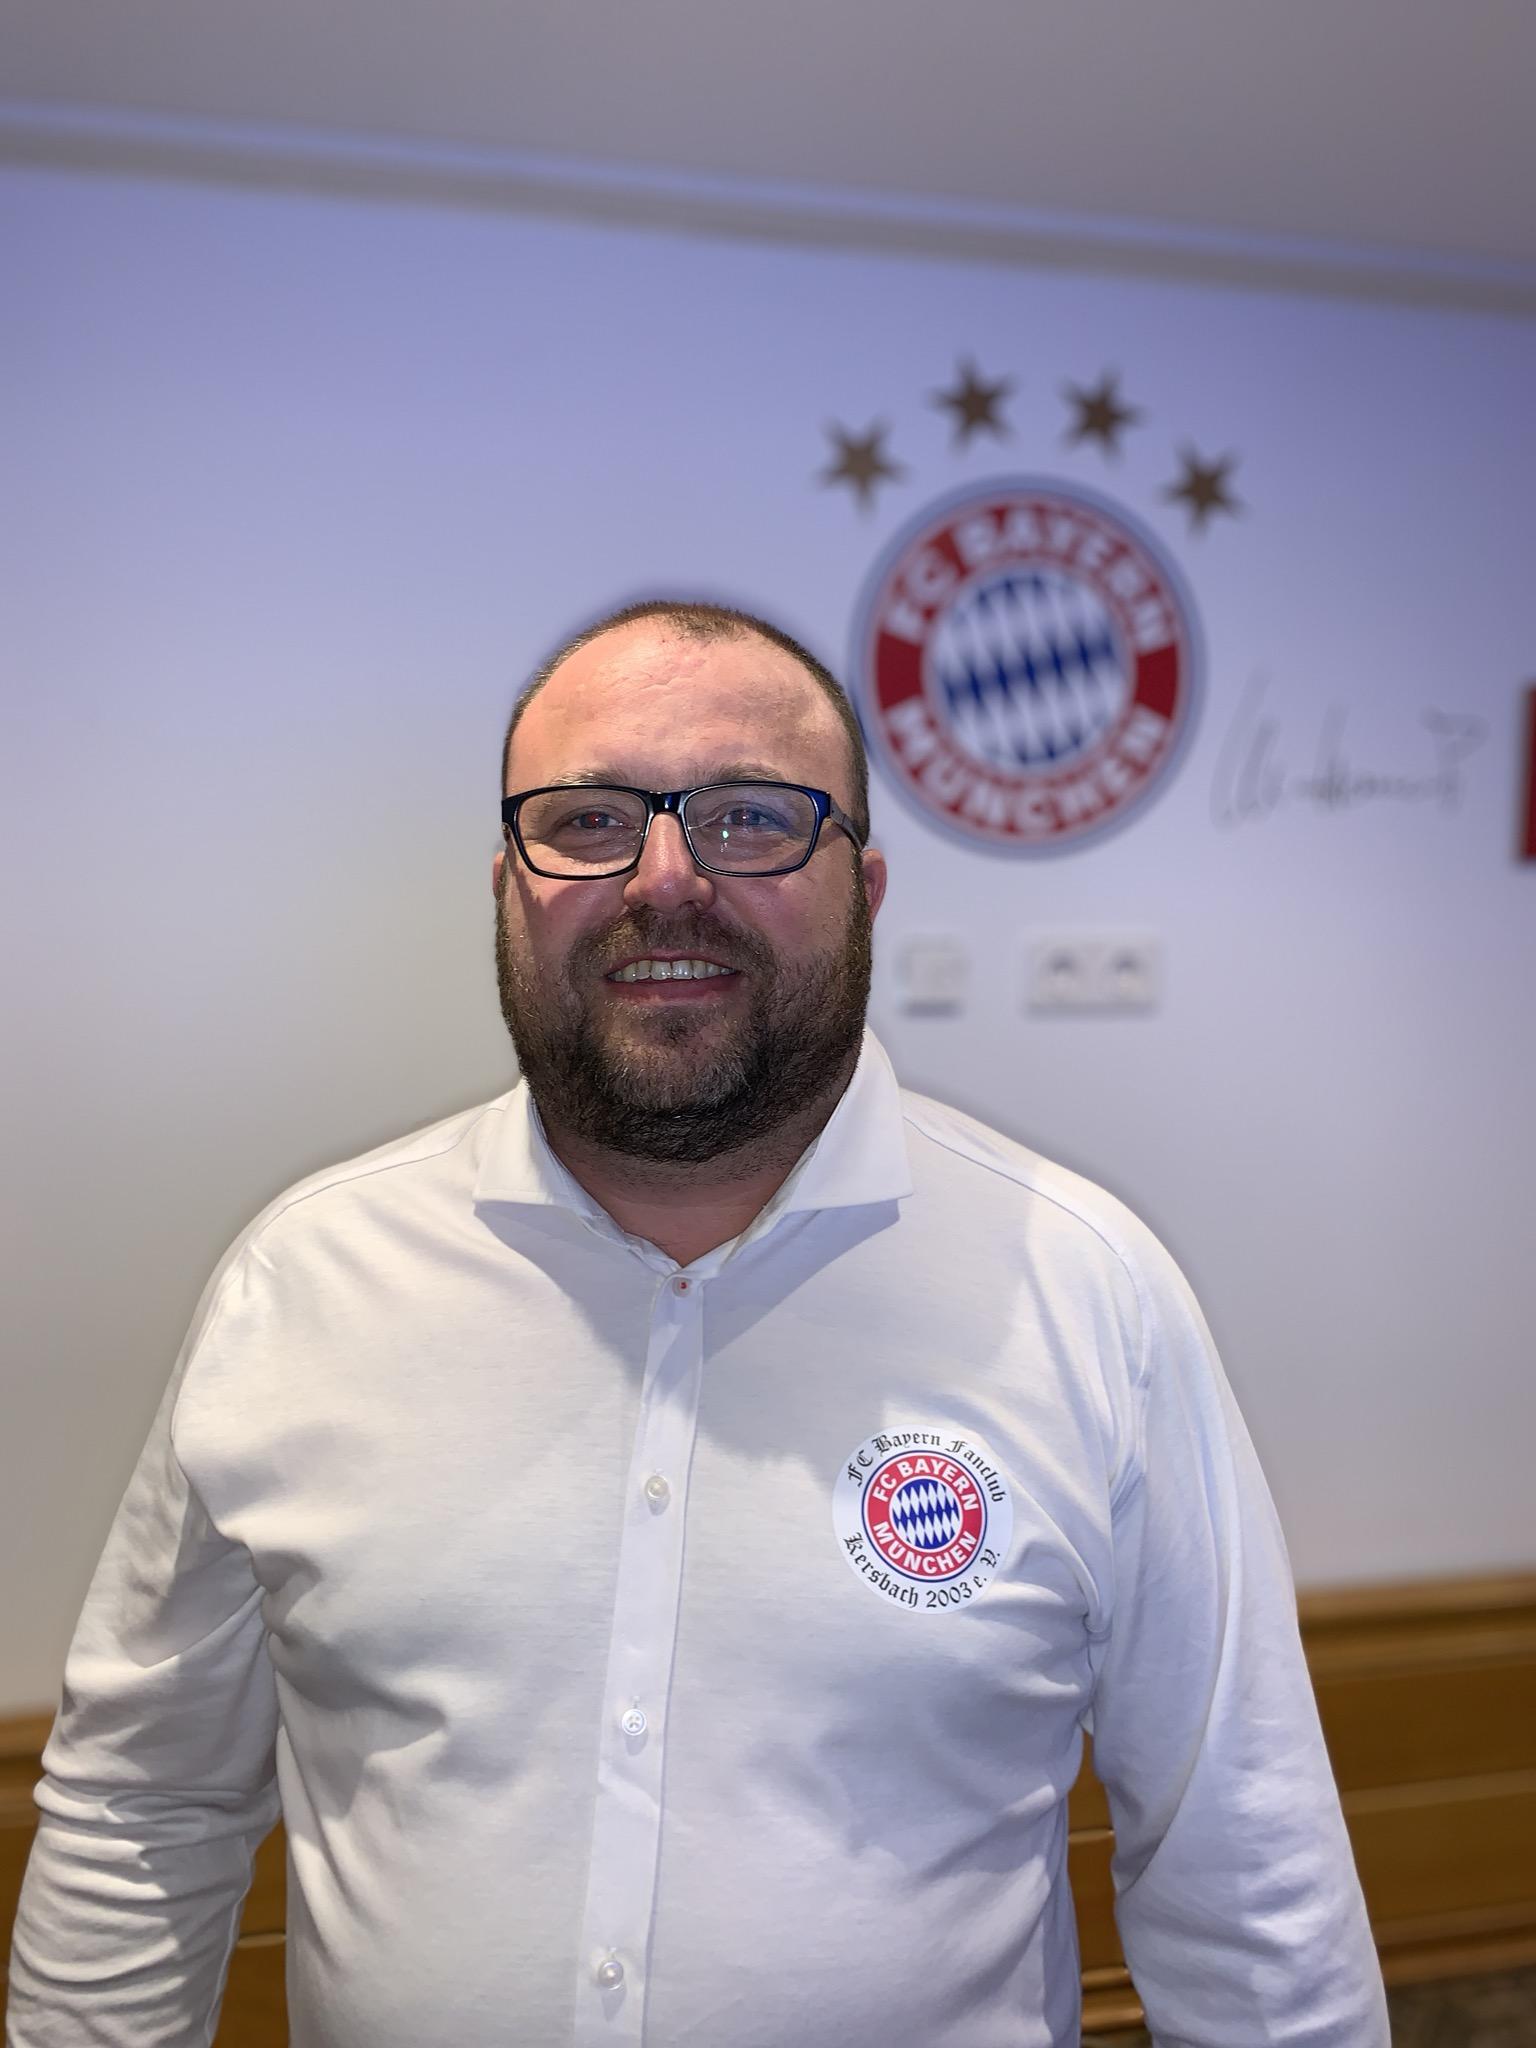 Florian Greif